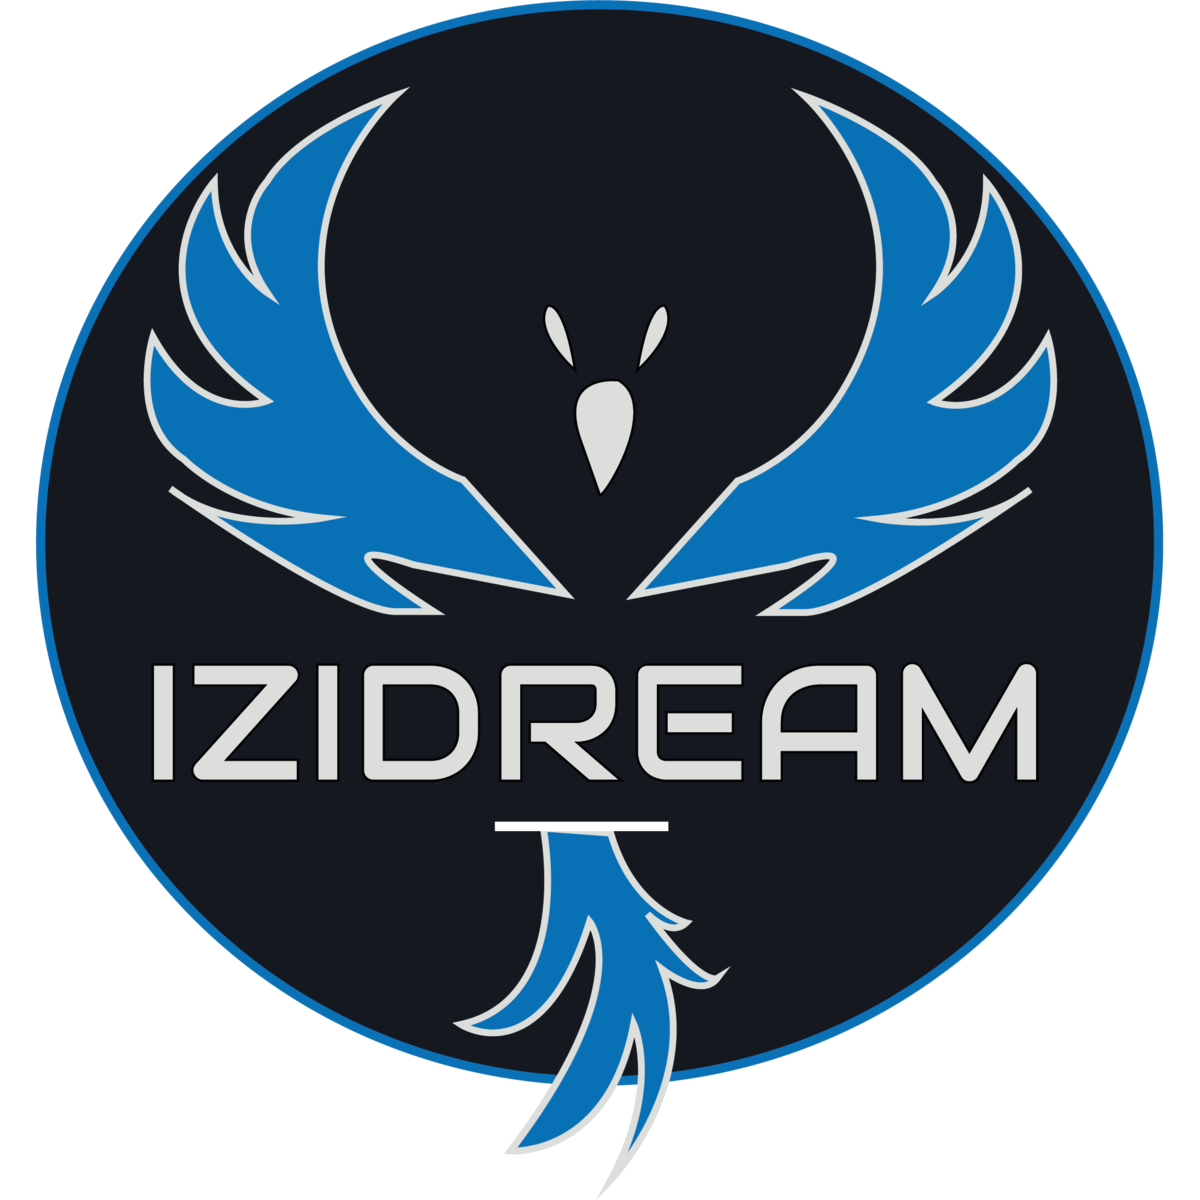 IziDream team logo